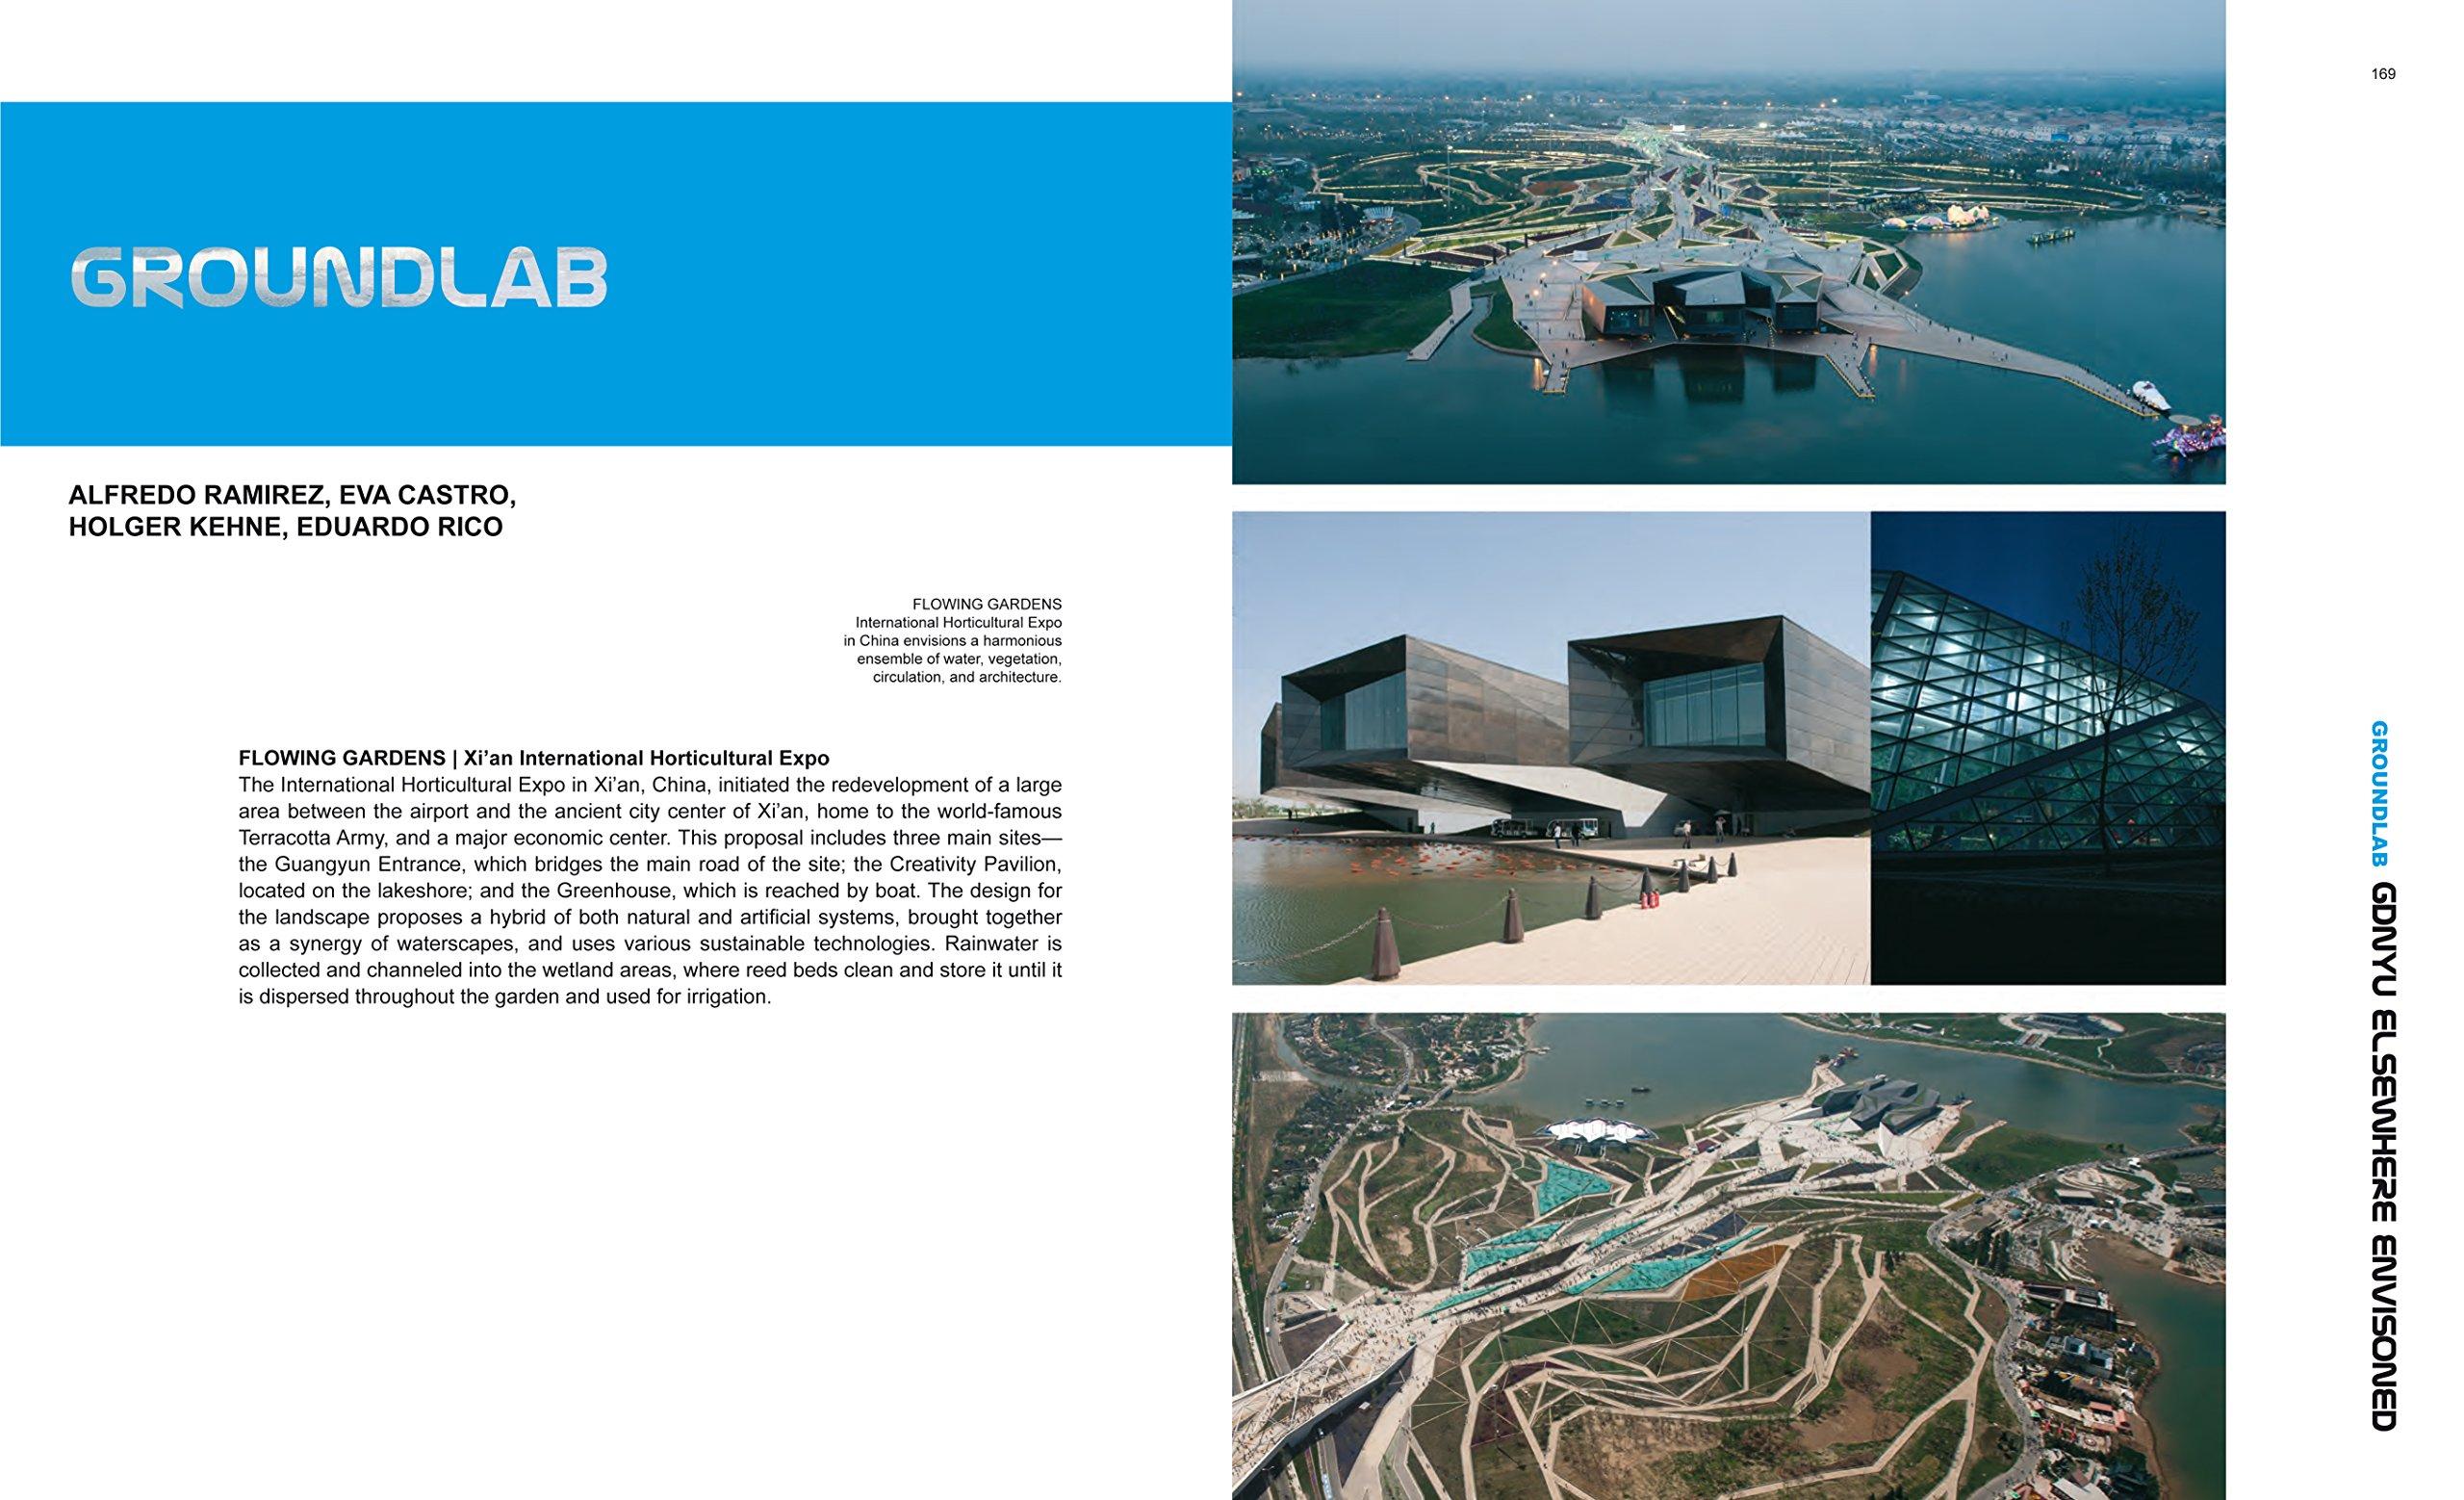 Global Design by Prestel